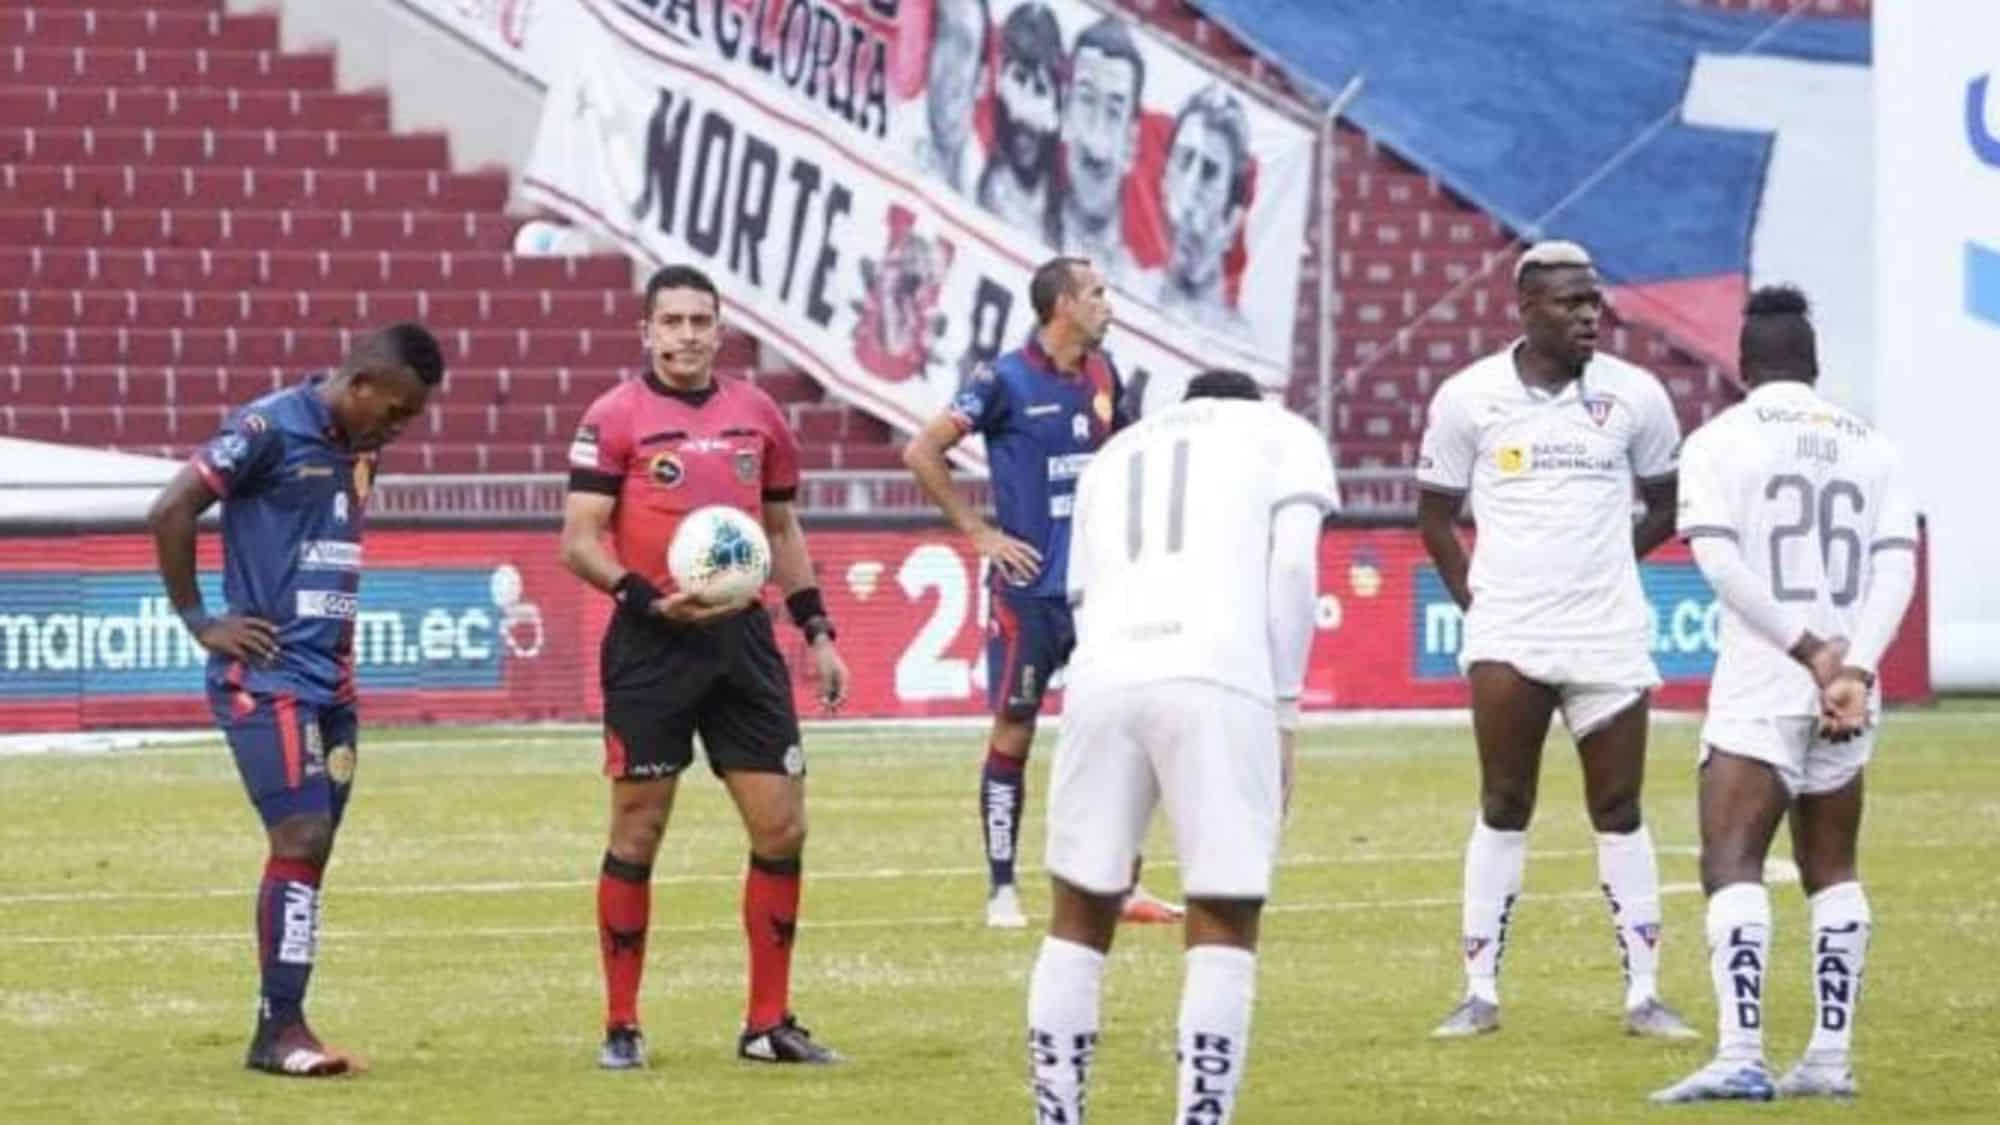 El homenaje de la liga ecuatoriana a Maradona frenaron los